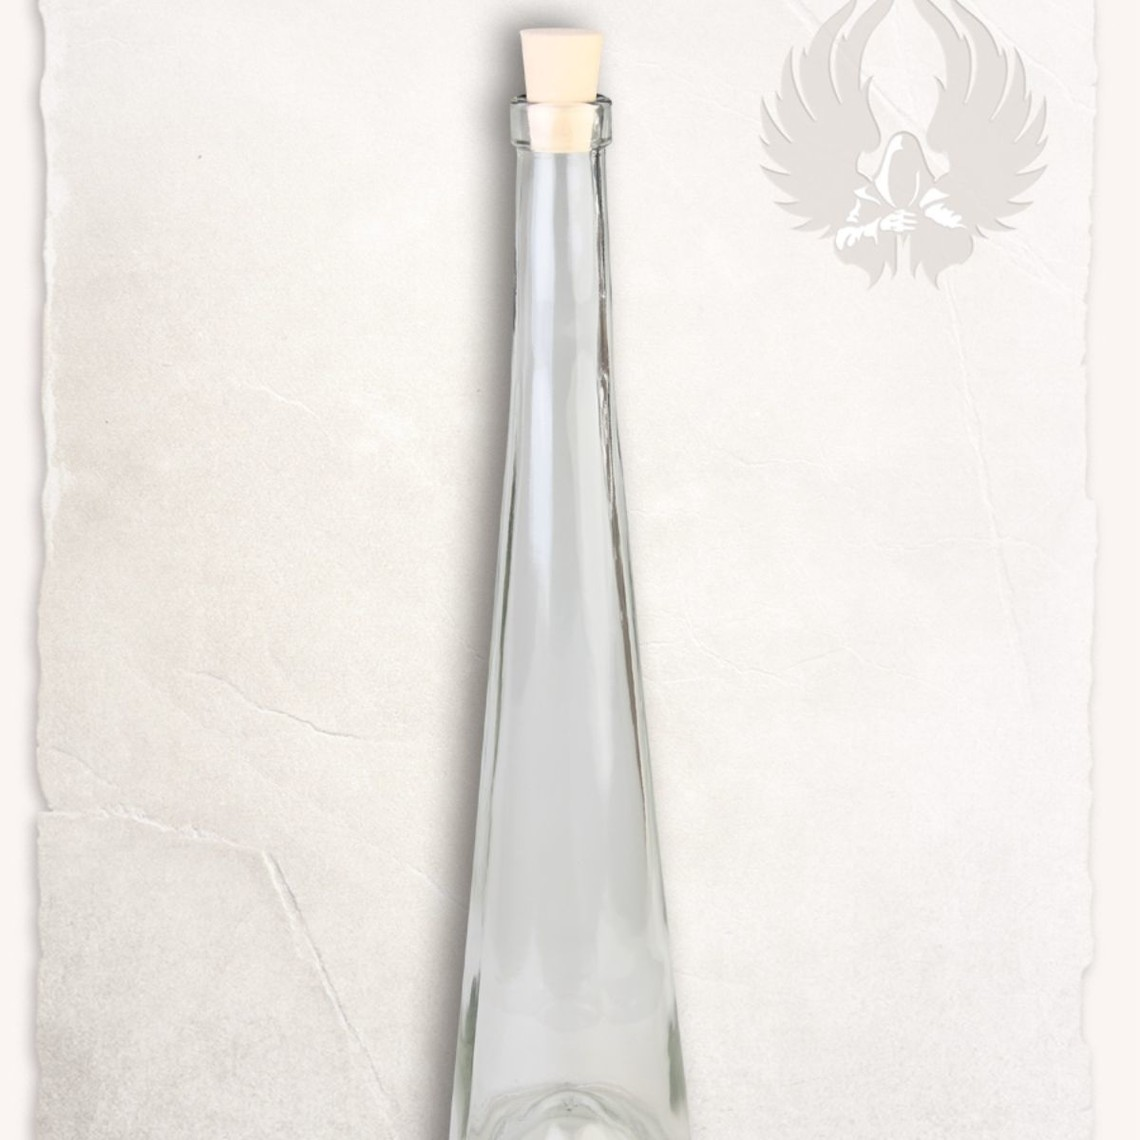 Mytholon Glazen fles 500 ml met kurk